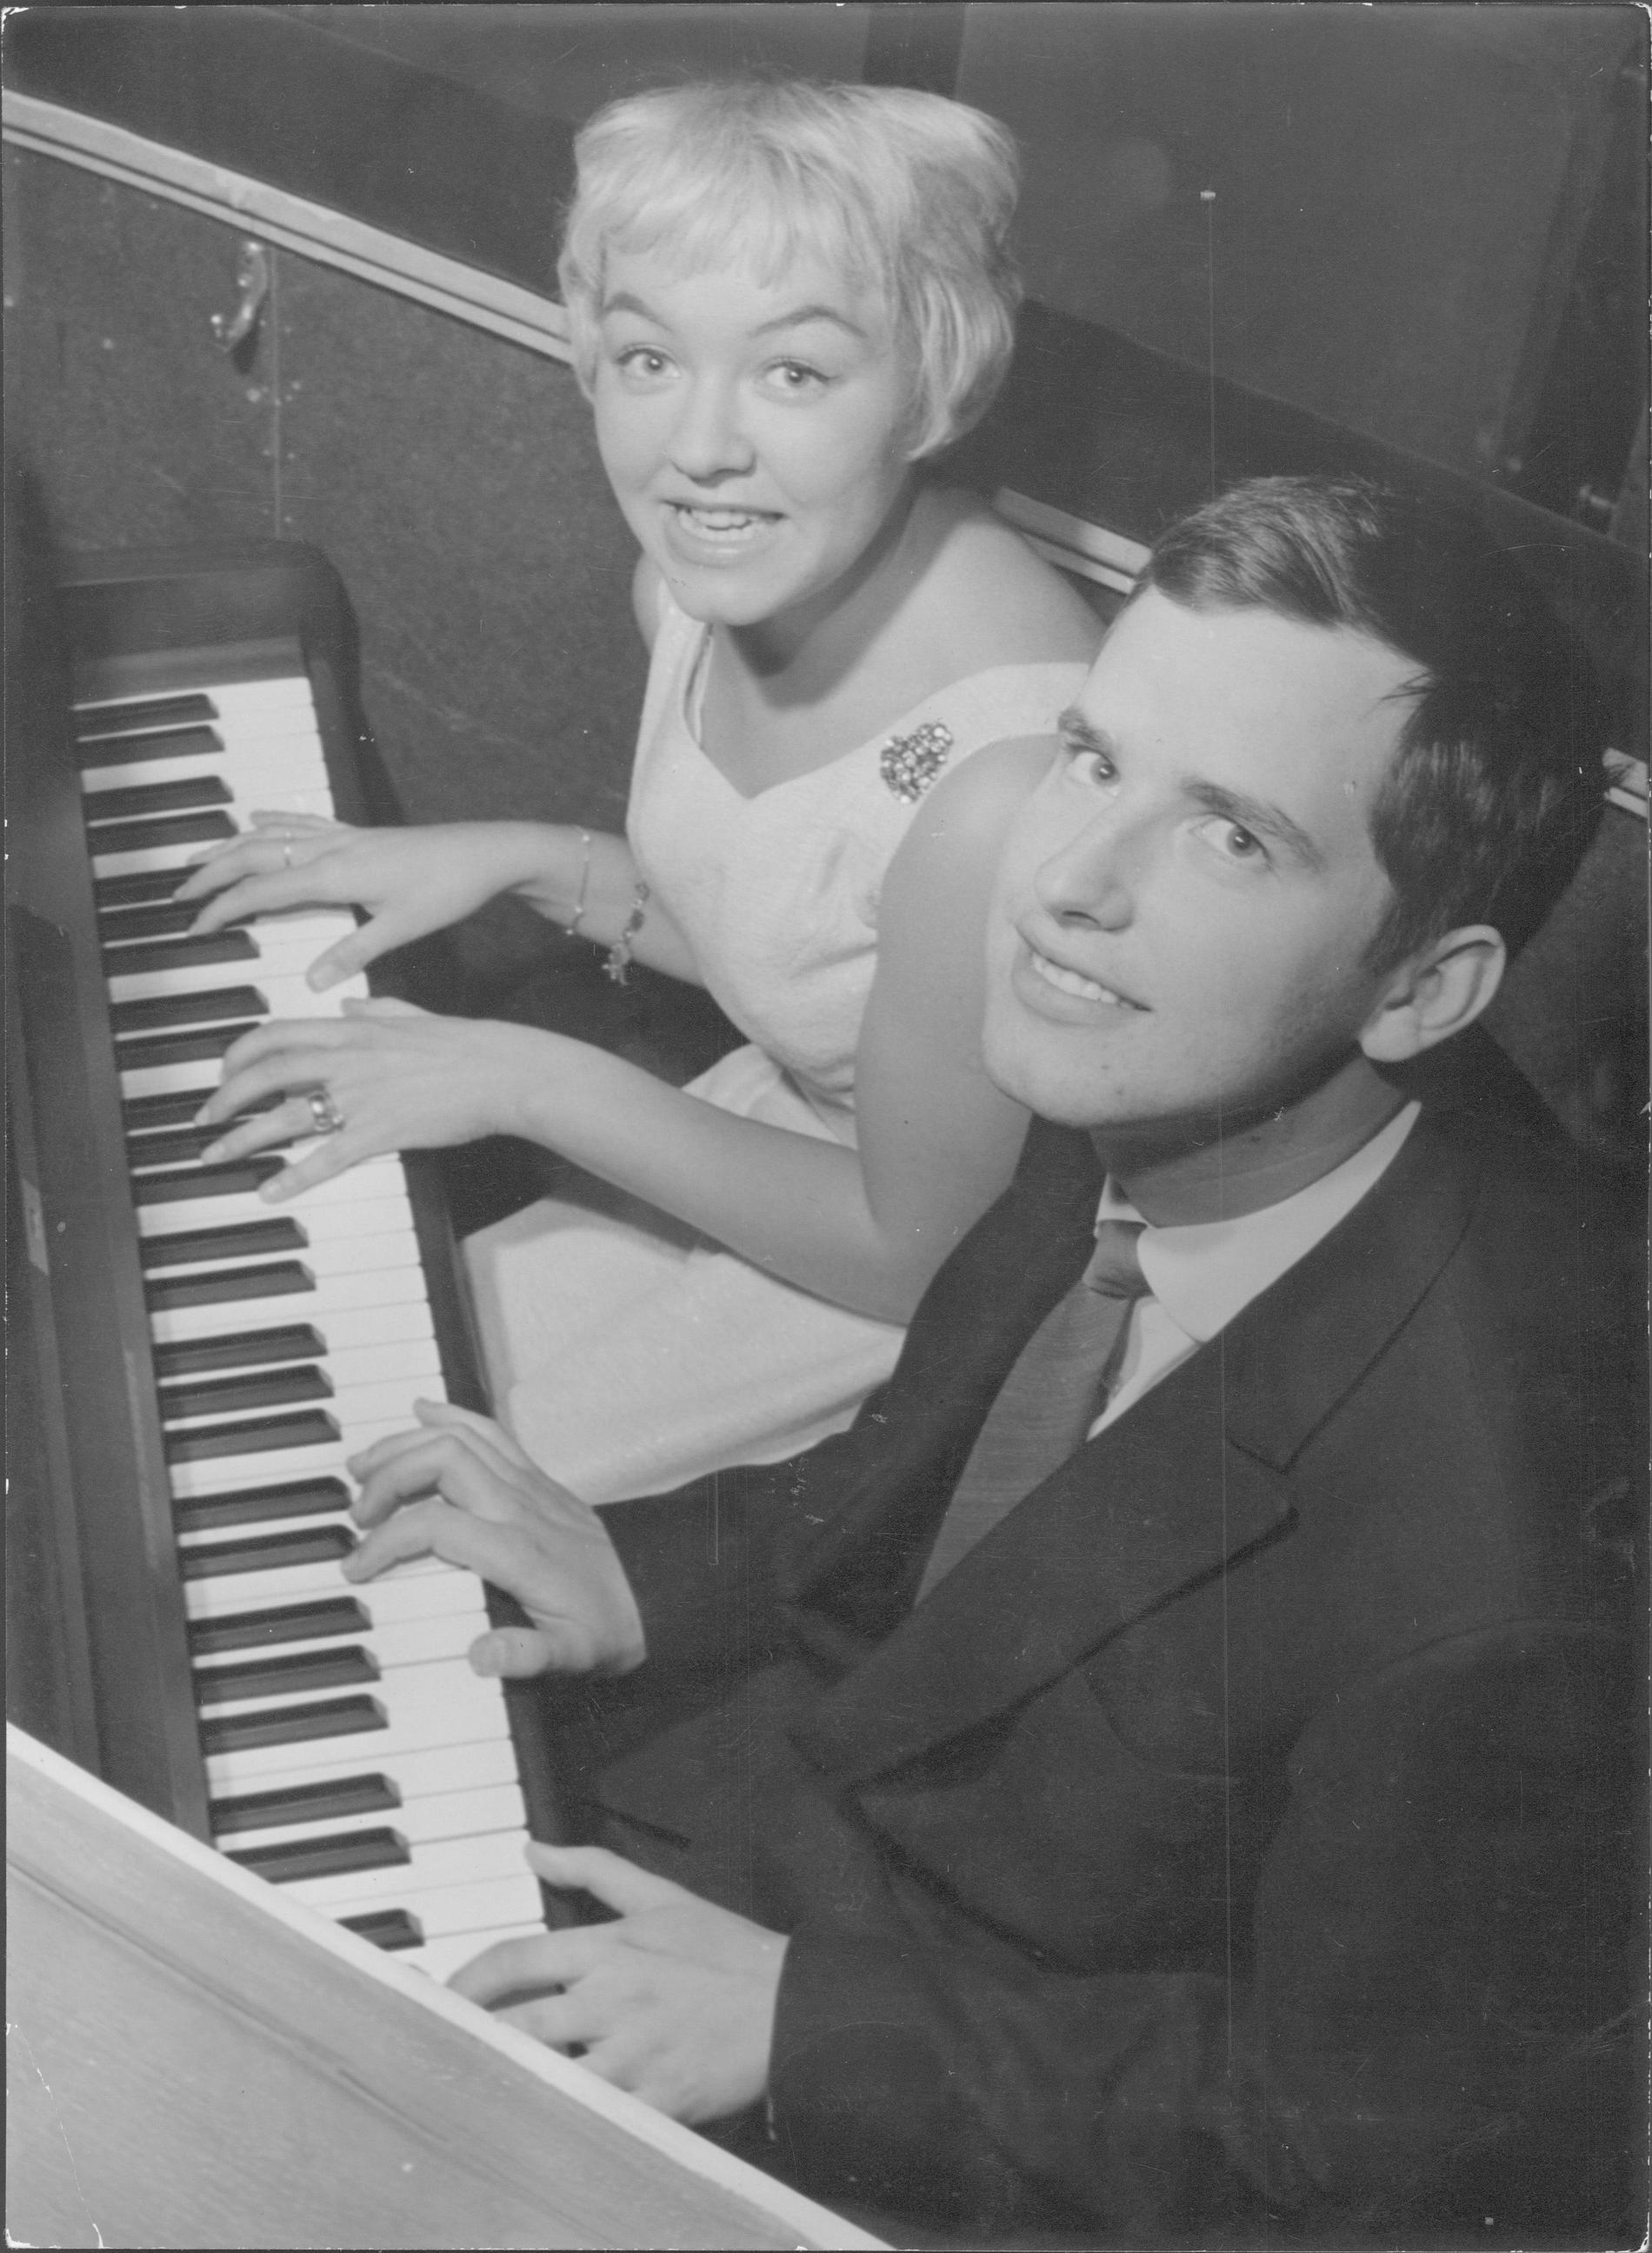 Monica och Carl-Axel Dominique spelar dubbelpiano 1962.